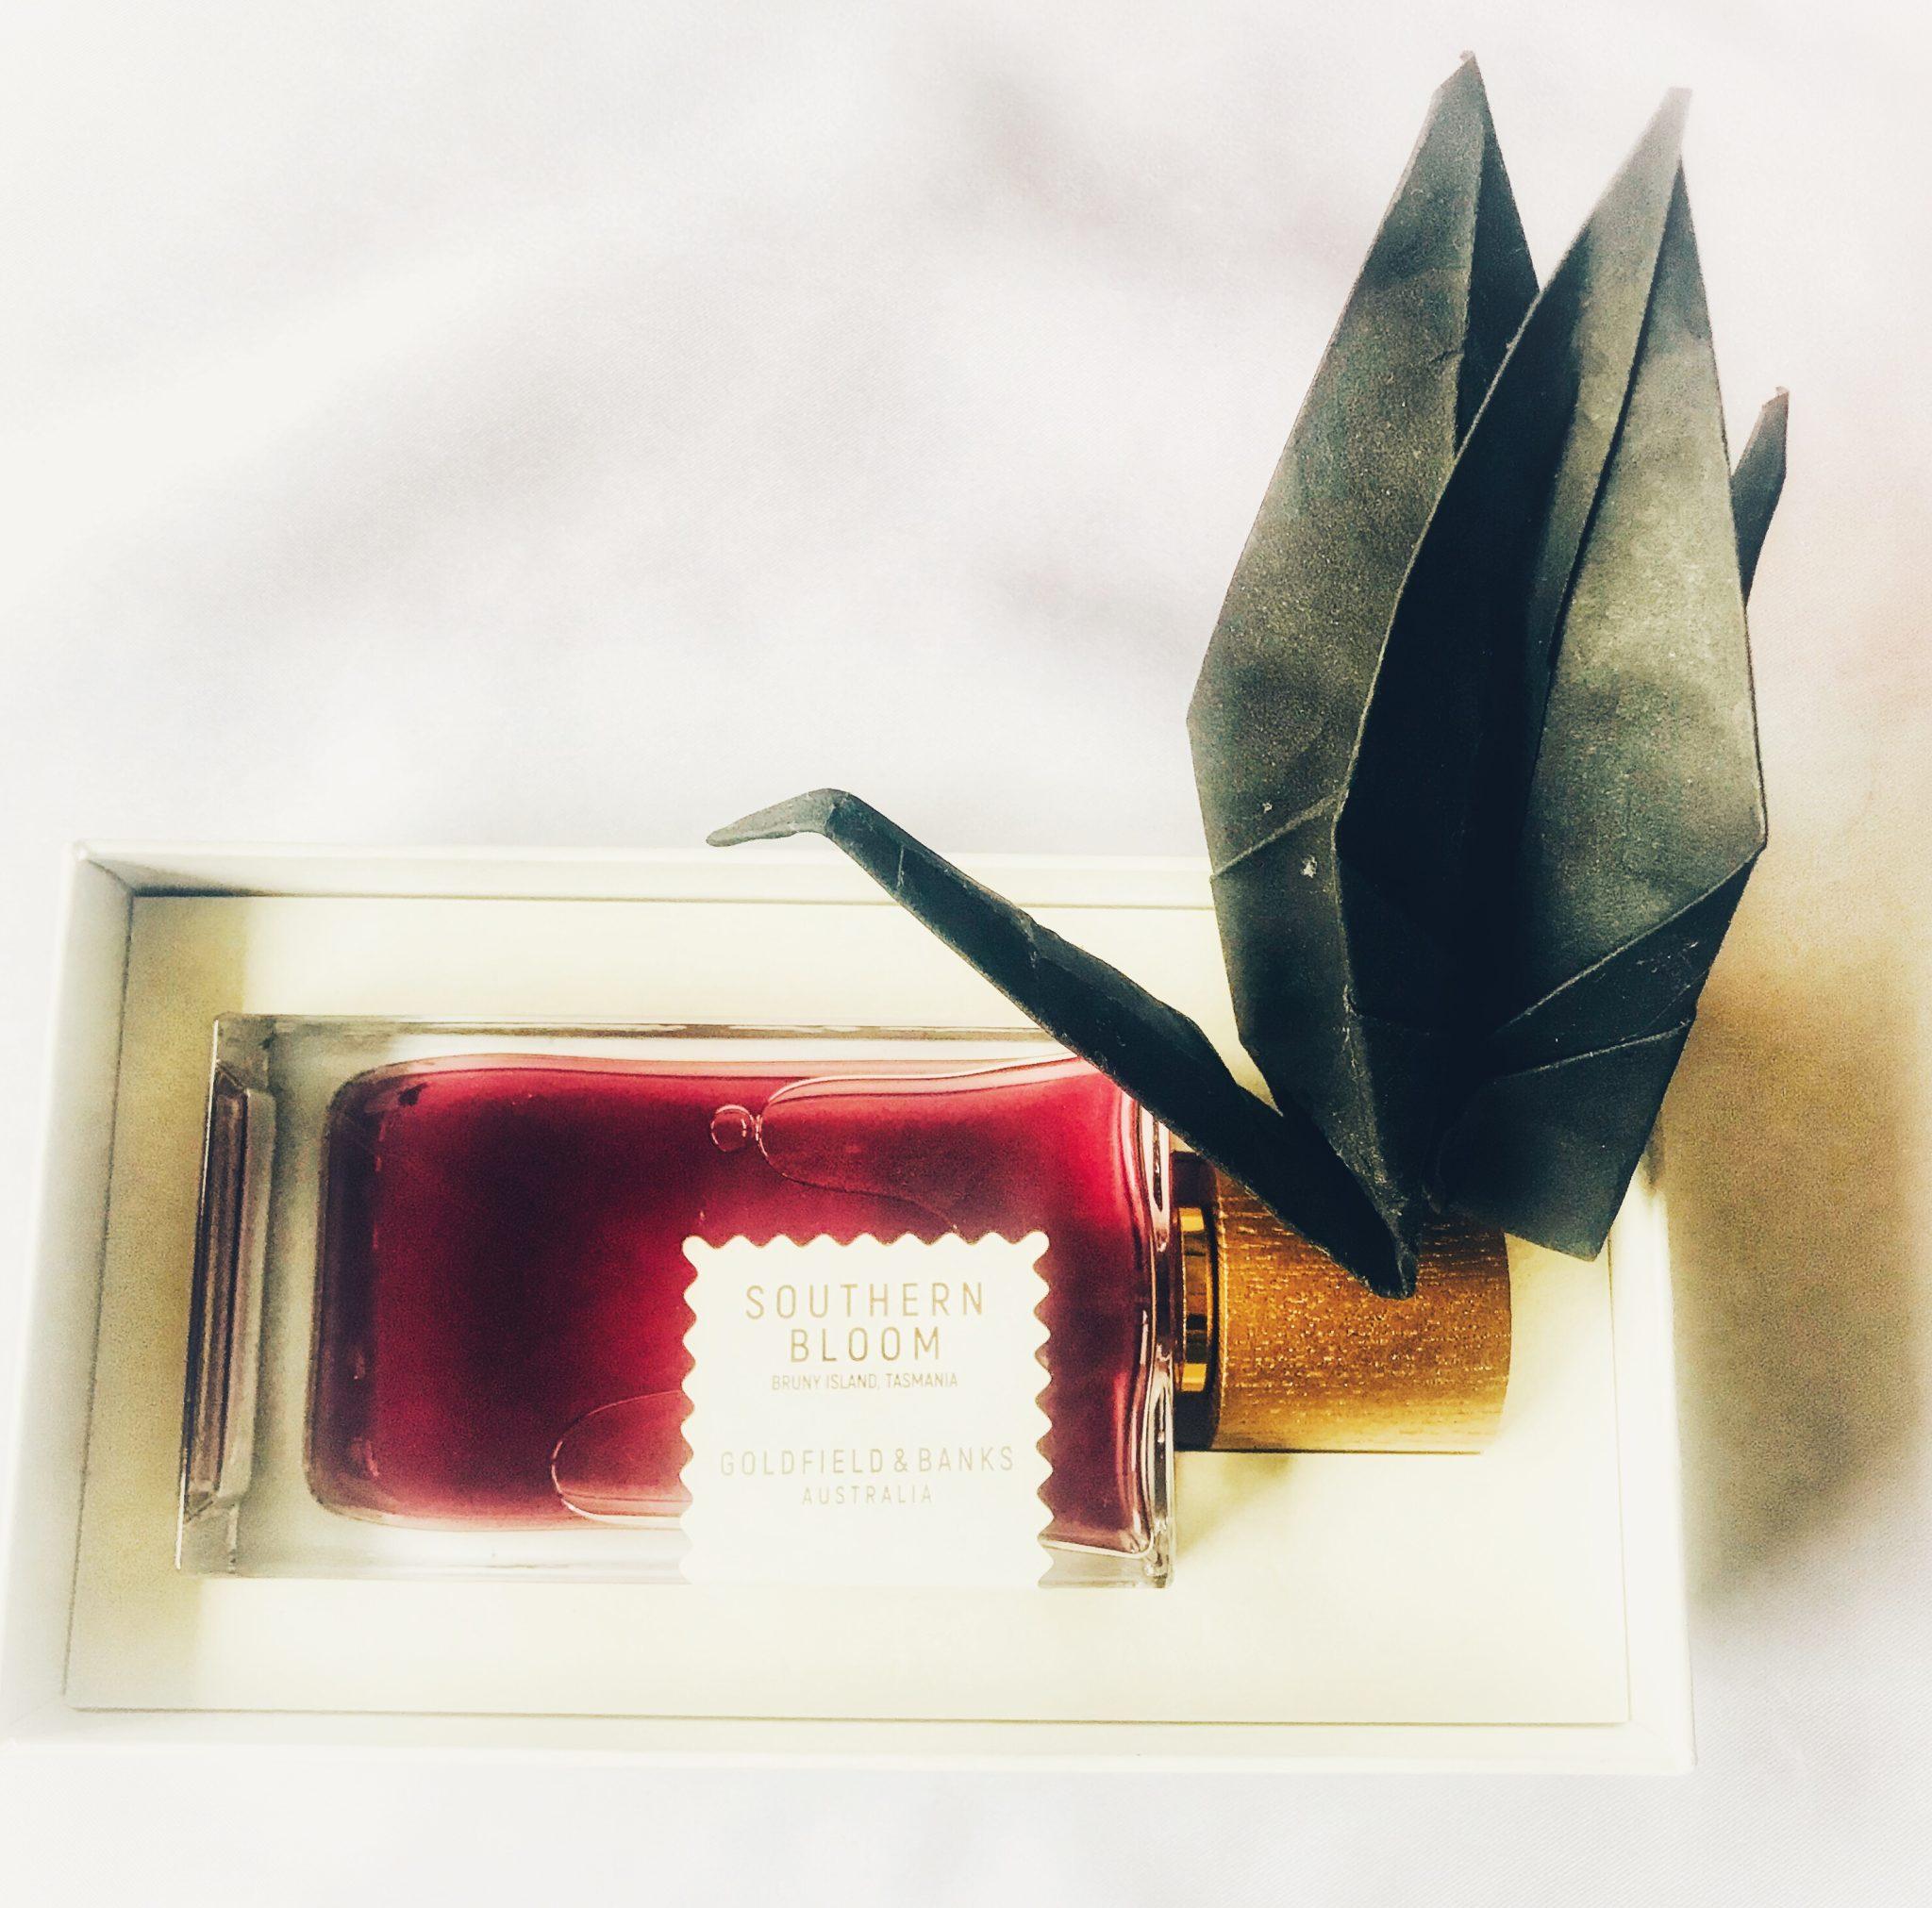 Southern Bloom Perfume